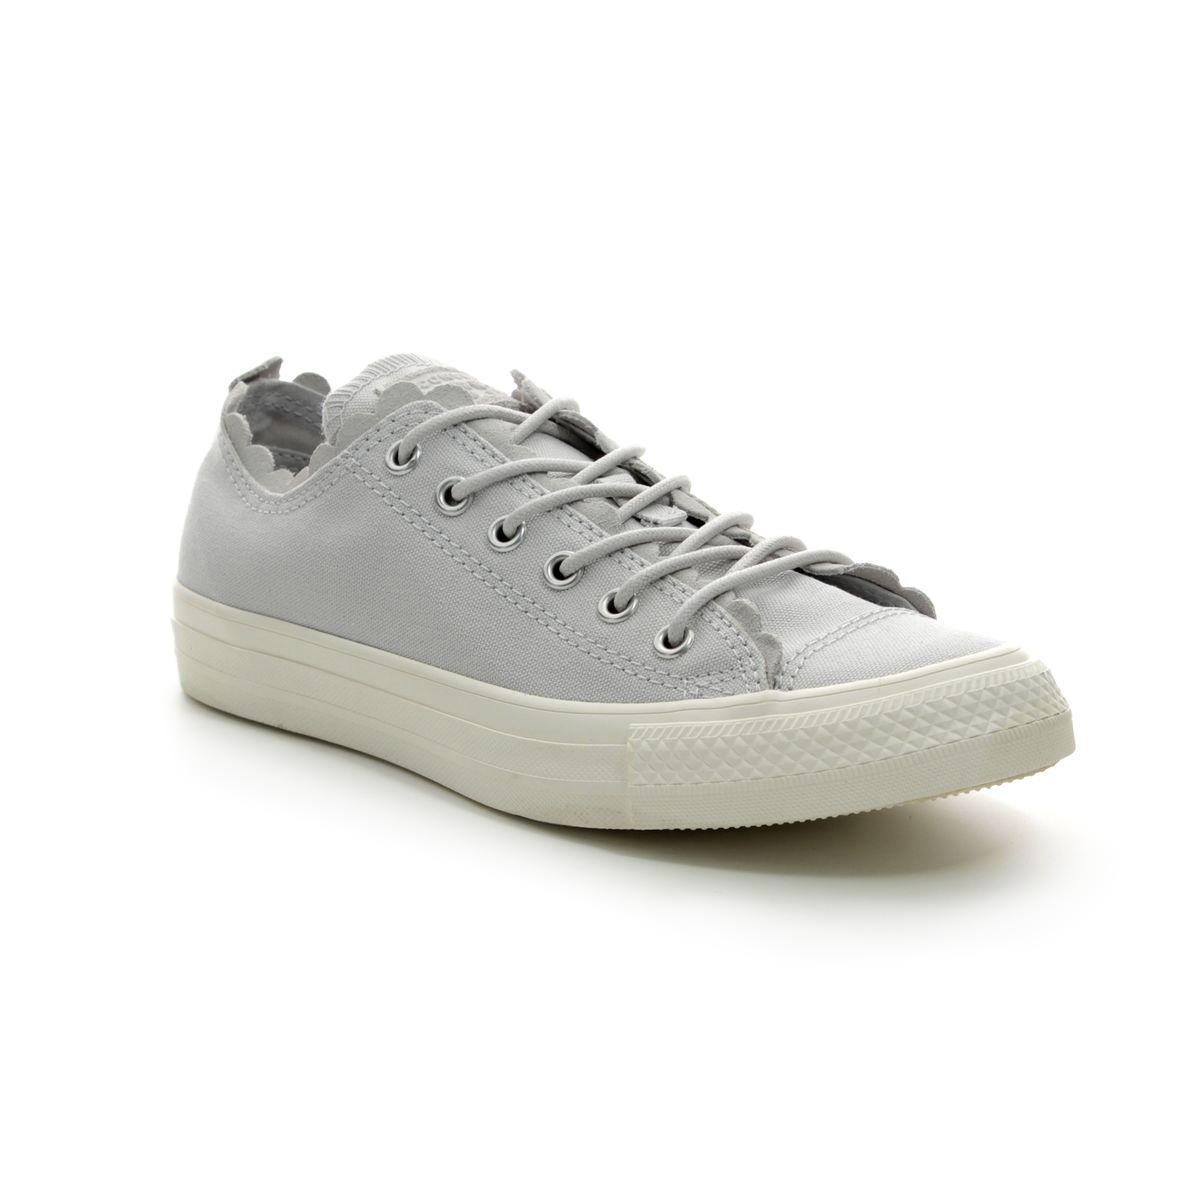 converse frill trainers \u003e Clearance shop